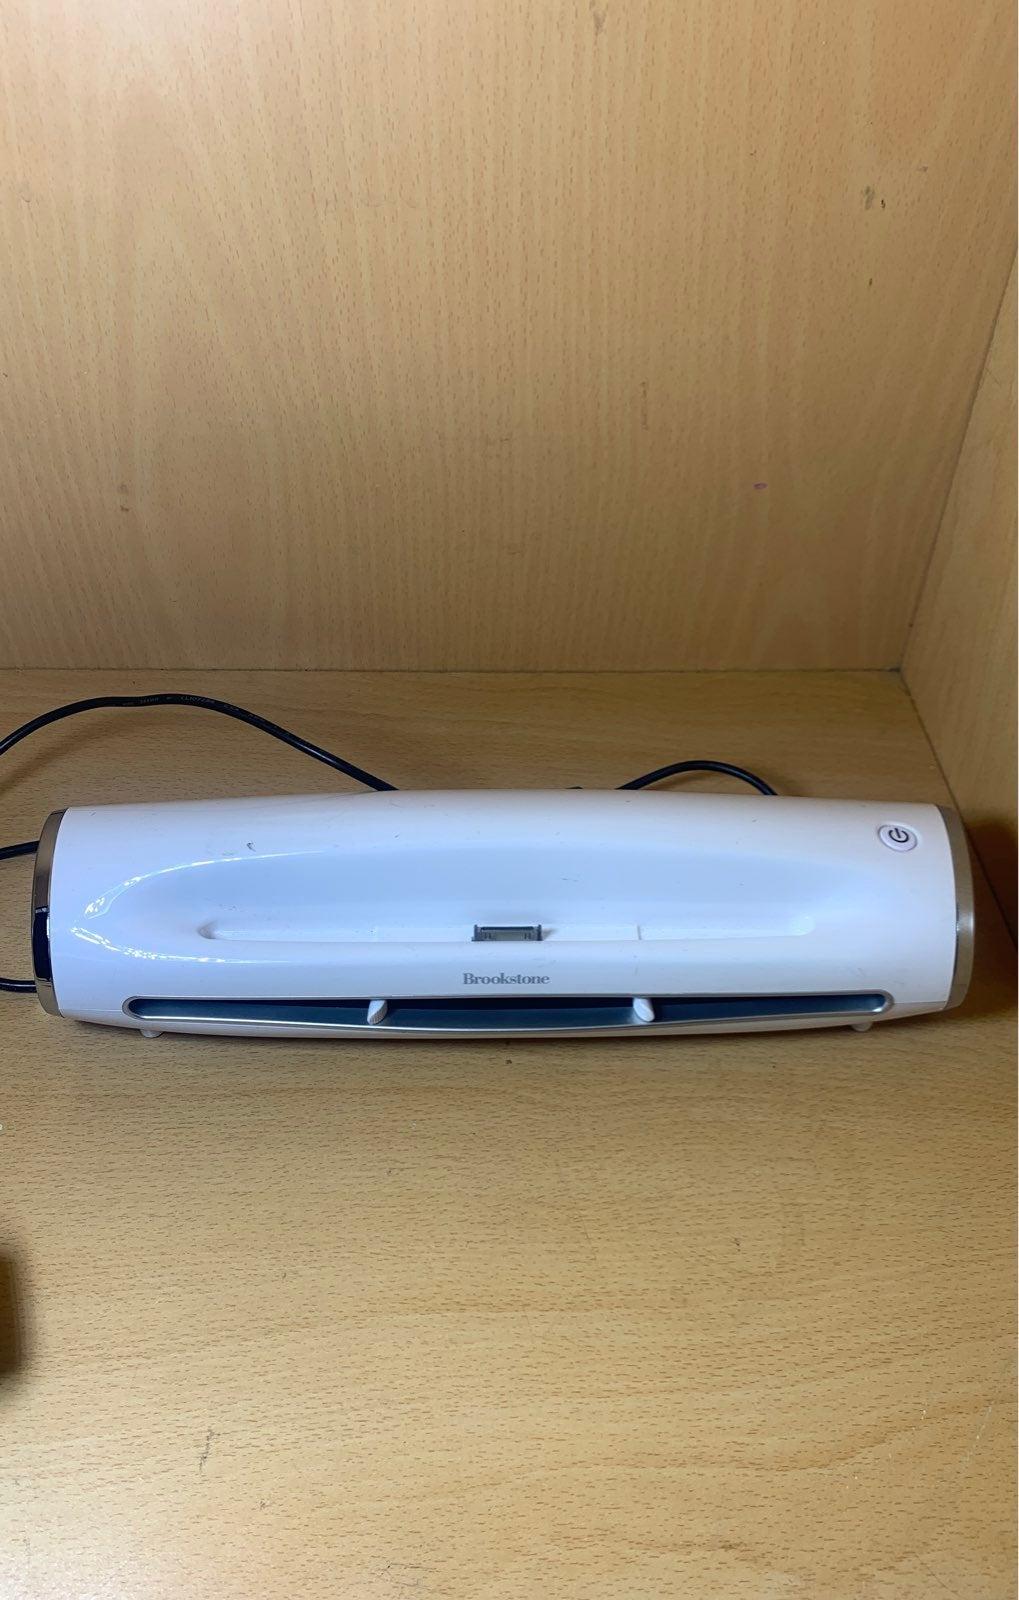 Brookstone iConvert Portable Scanner